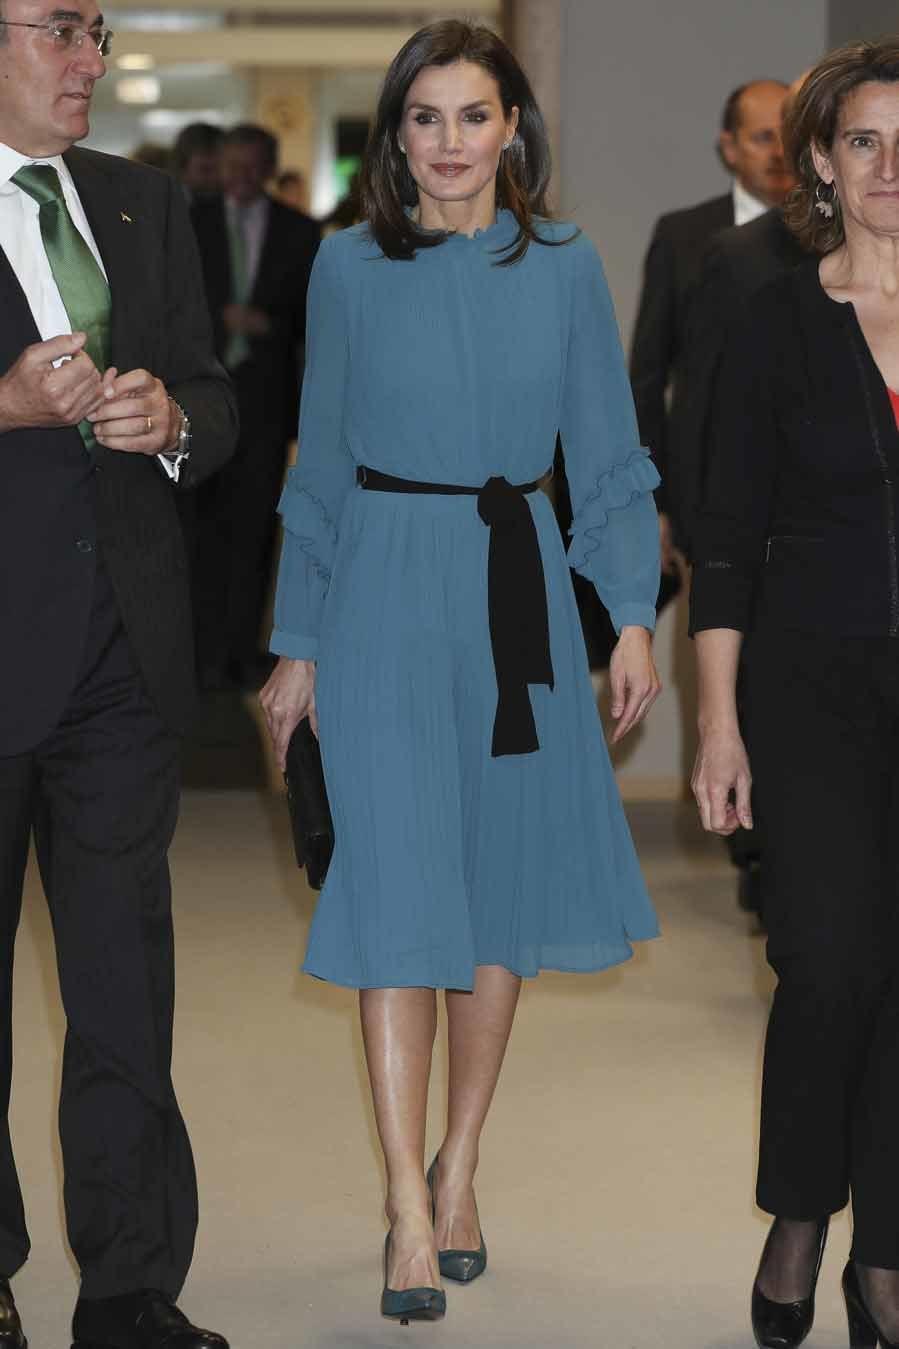 La Reina Letizia, con vestido-mono  azul de Zara - Entrega de becas  Iberdrola